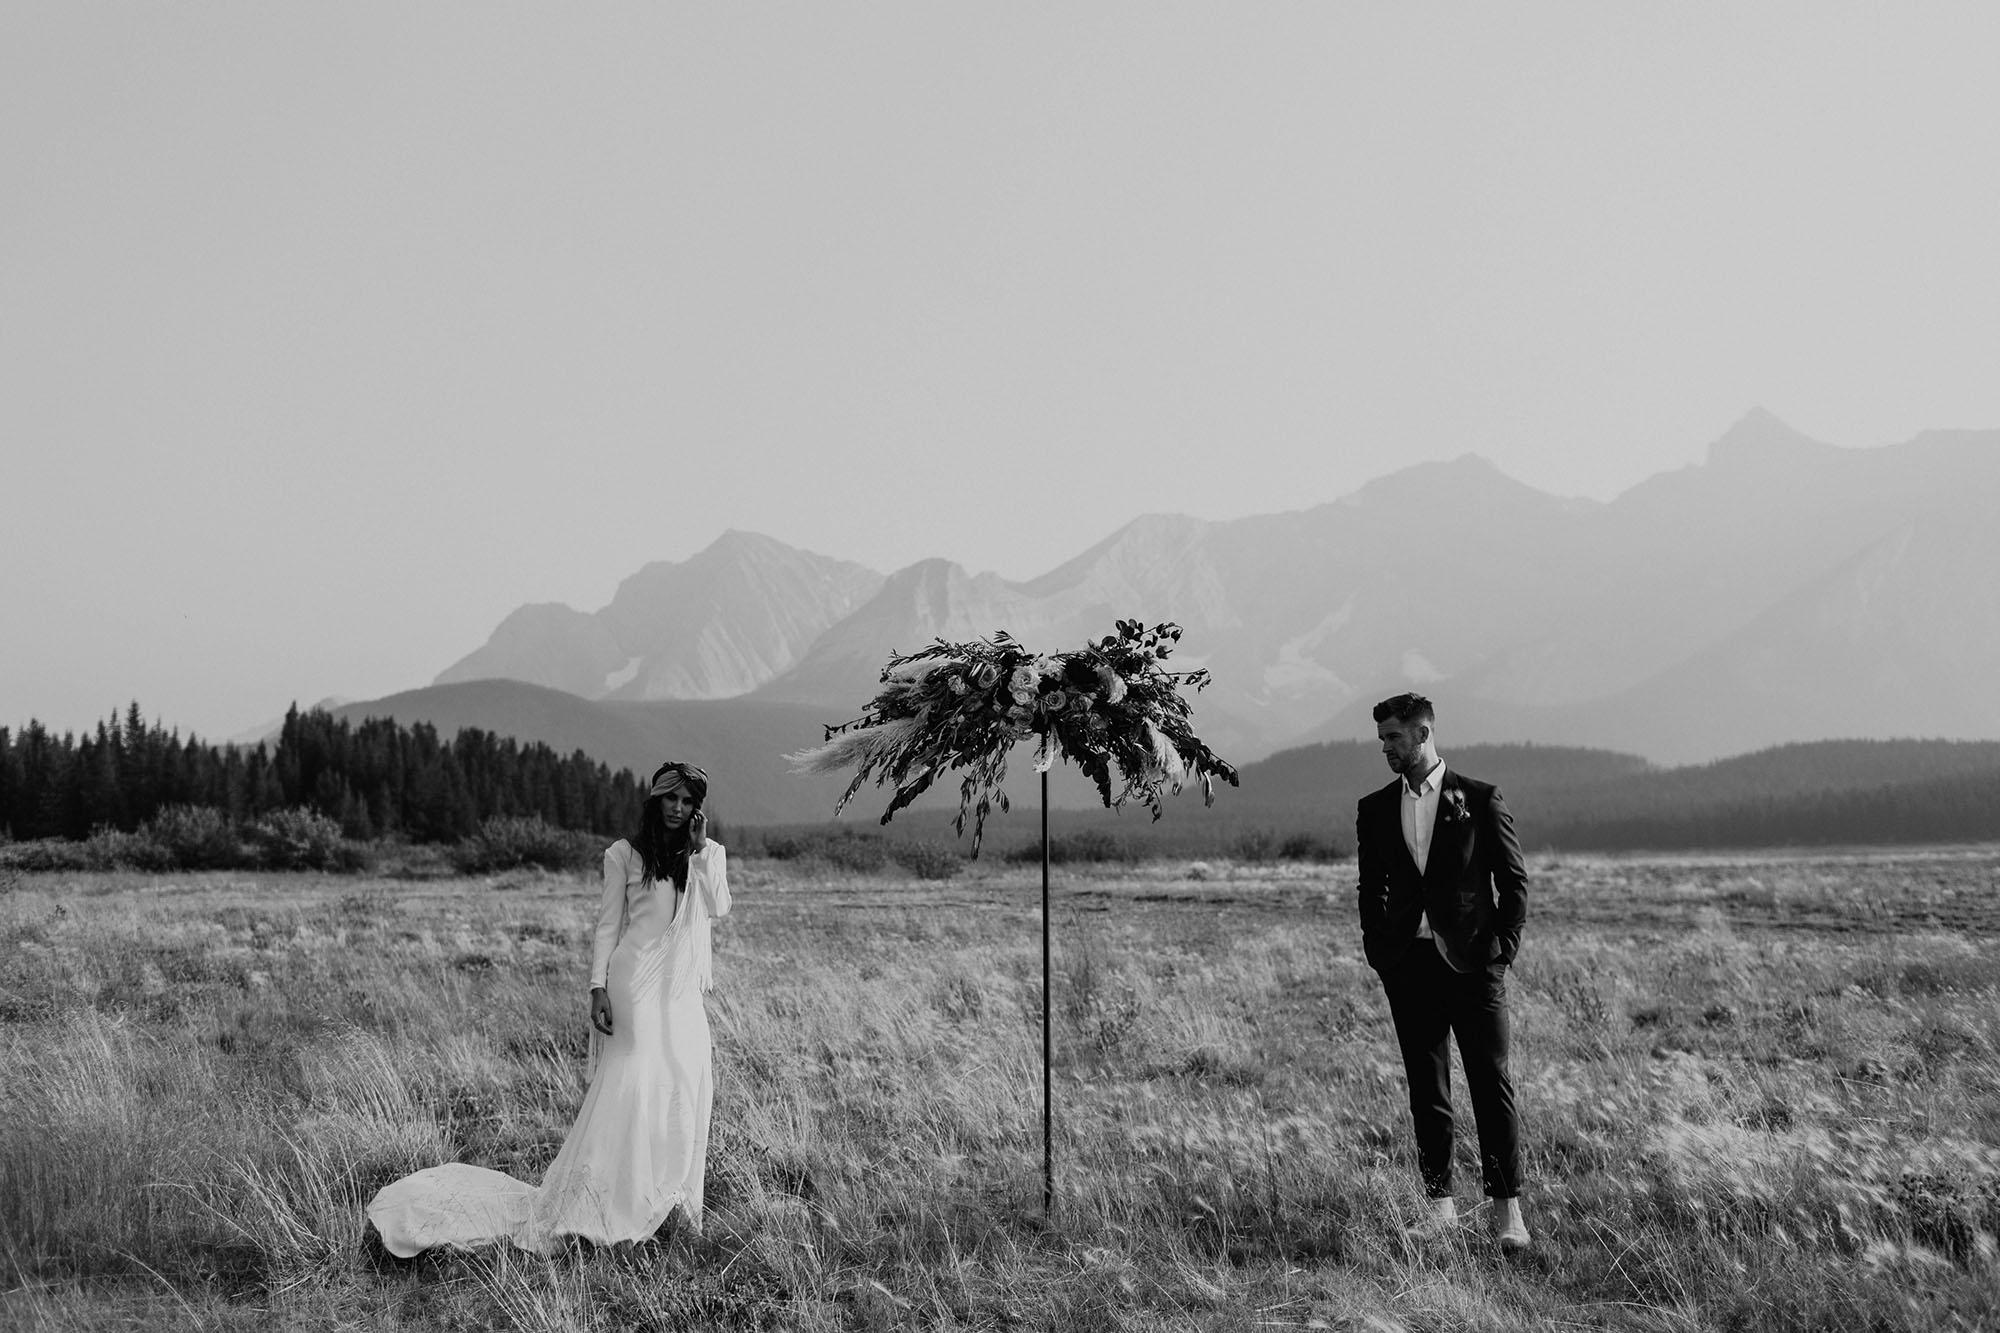 banff_elopement_photography_workshop26.jpg